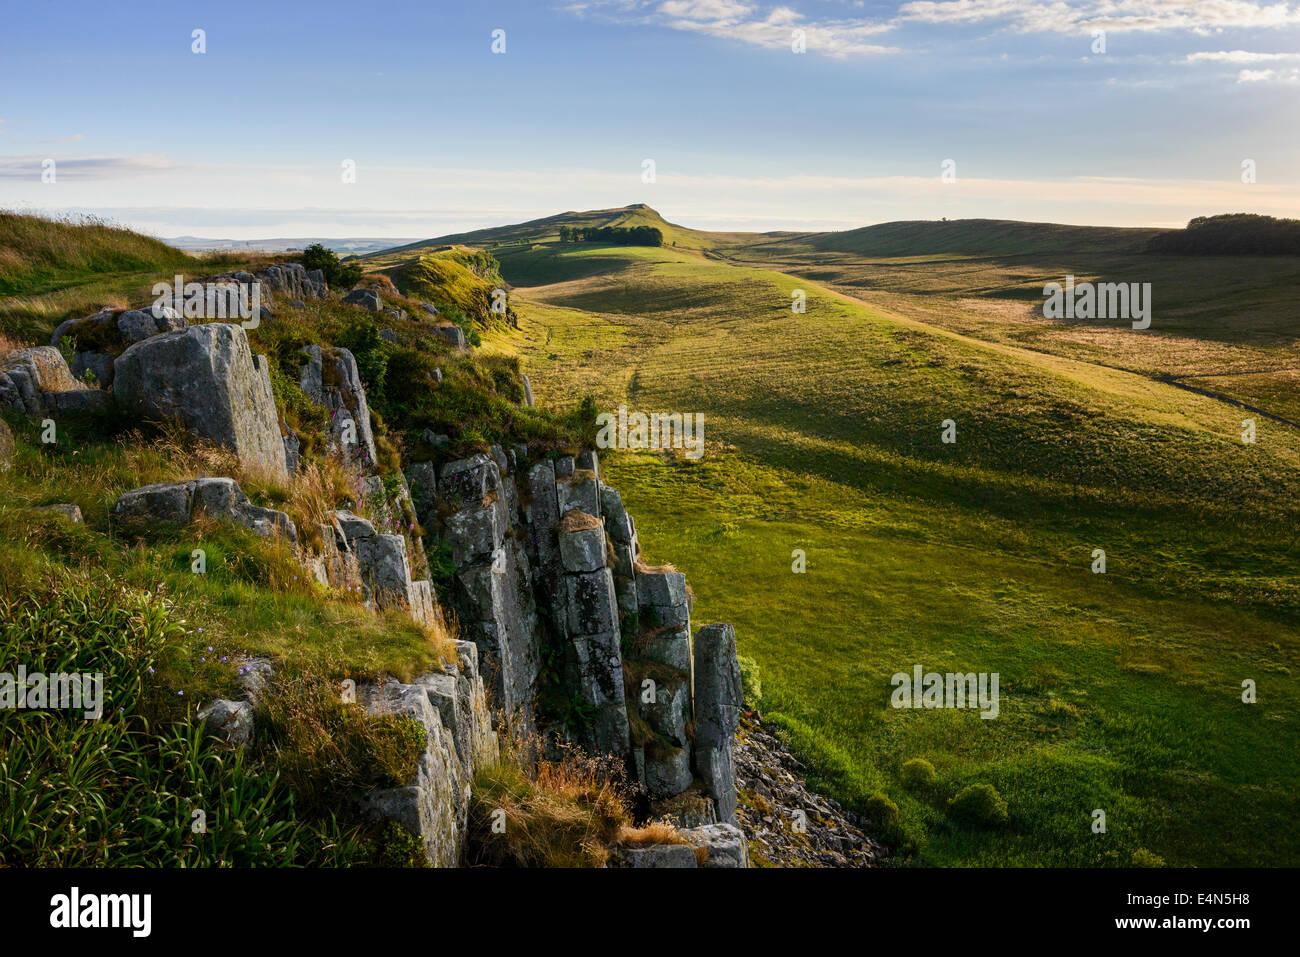 High Shield Crag - Stock Image